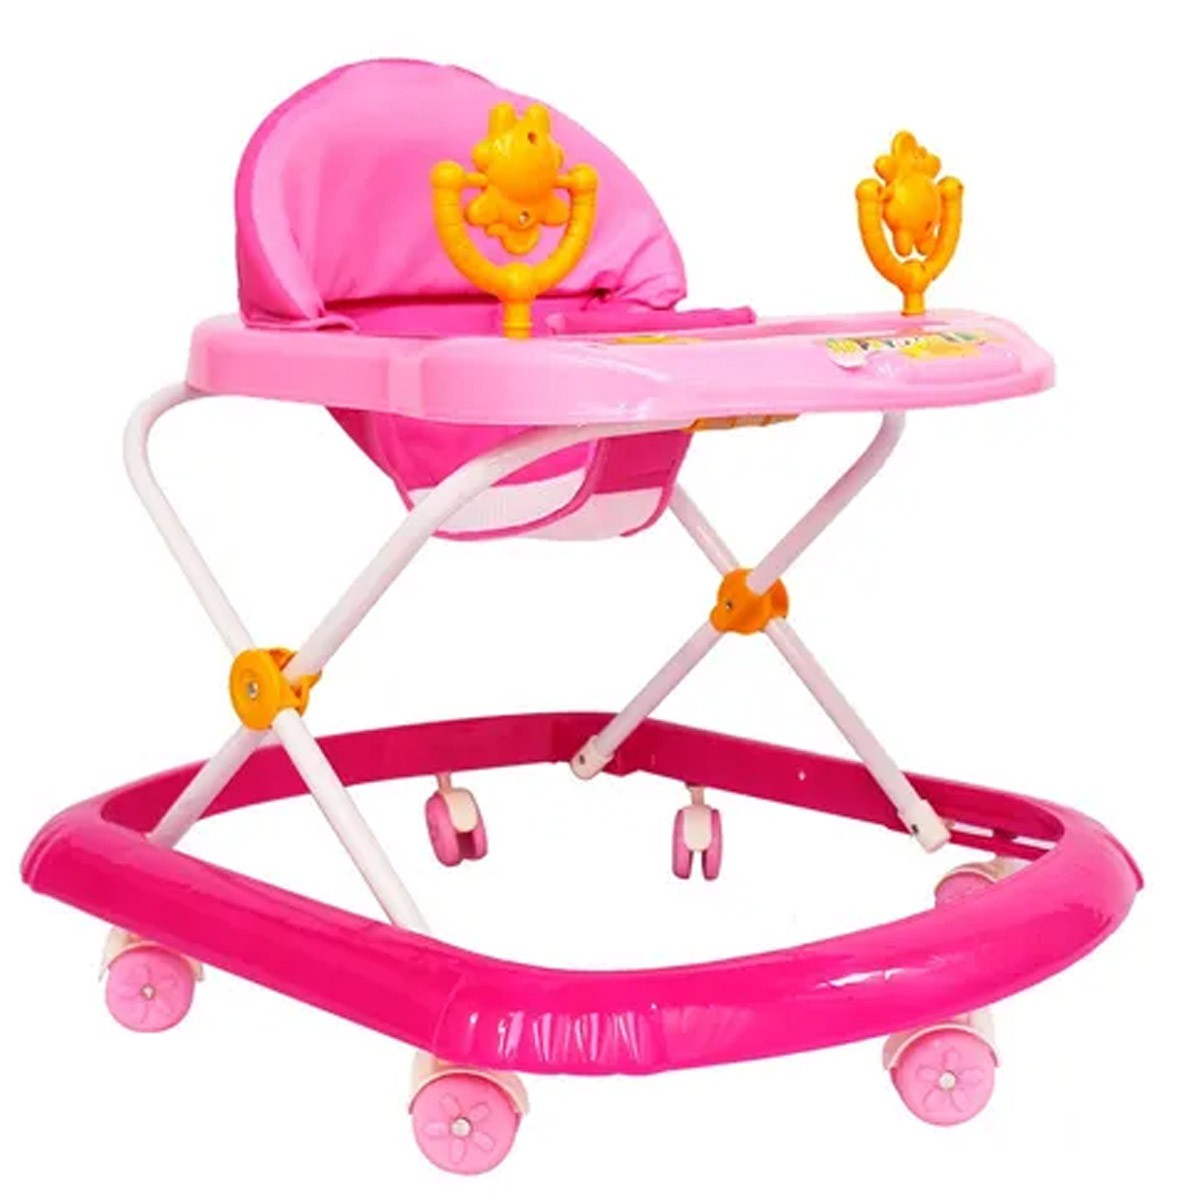 Andador Infantil Altura Regulável Com Som Importway Rosa